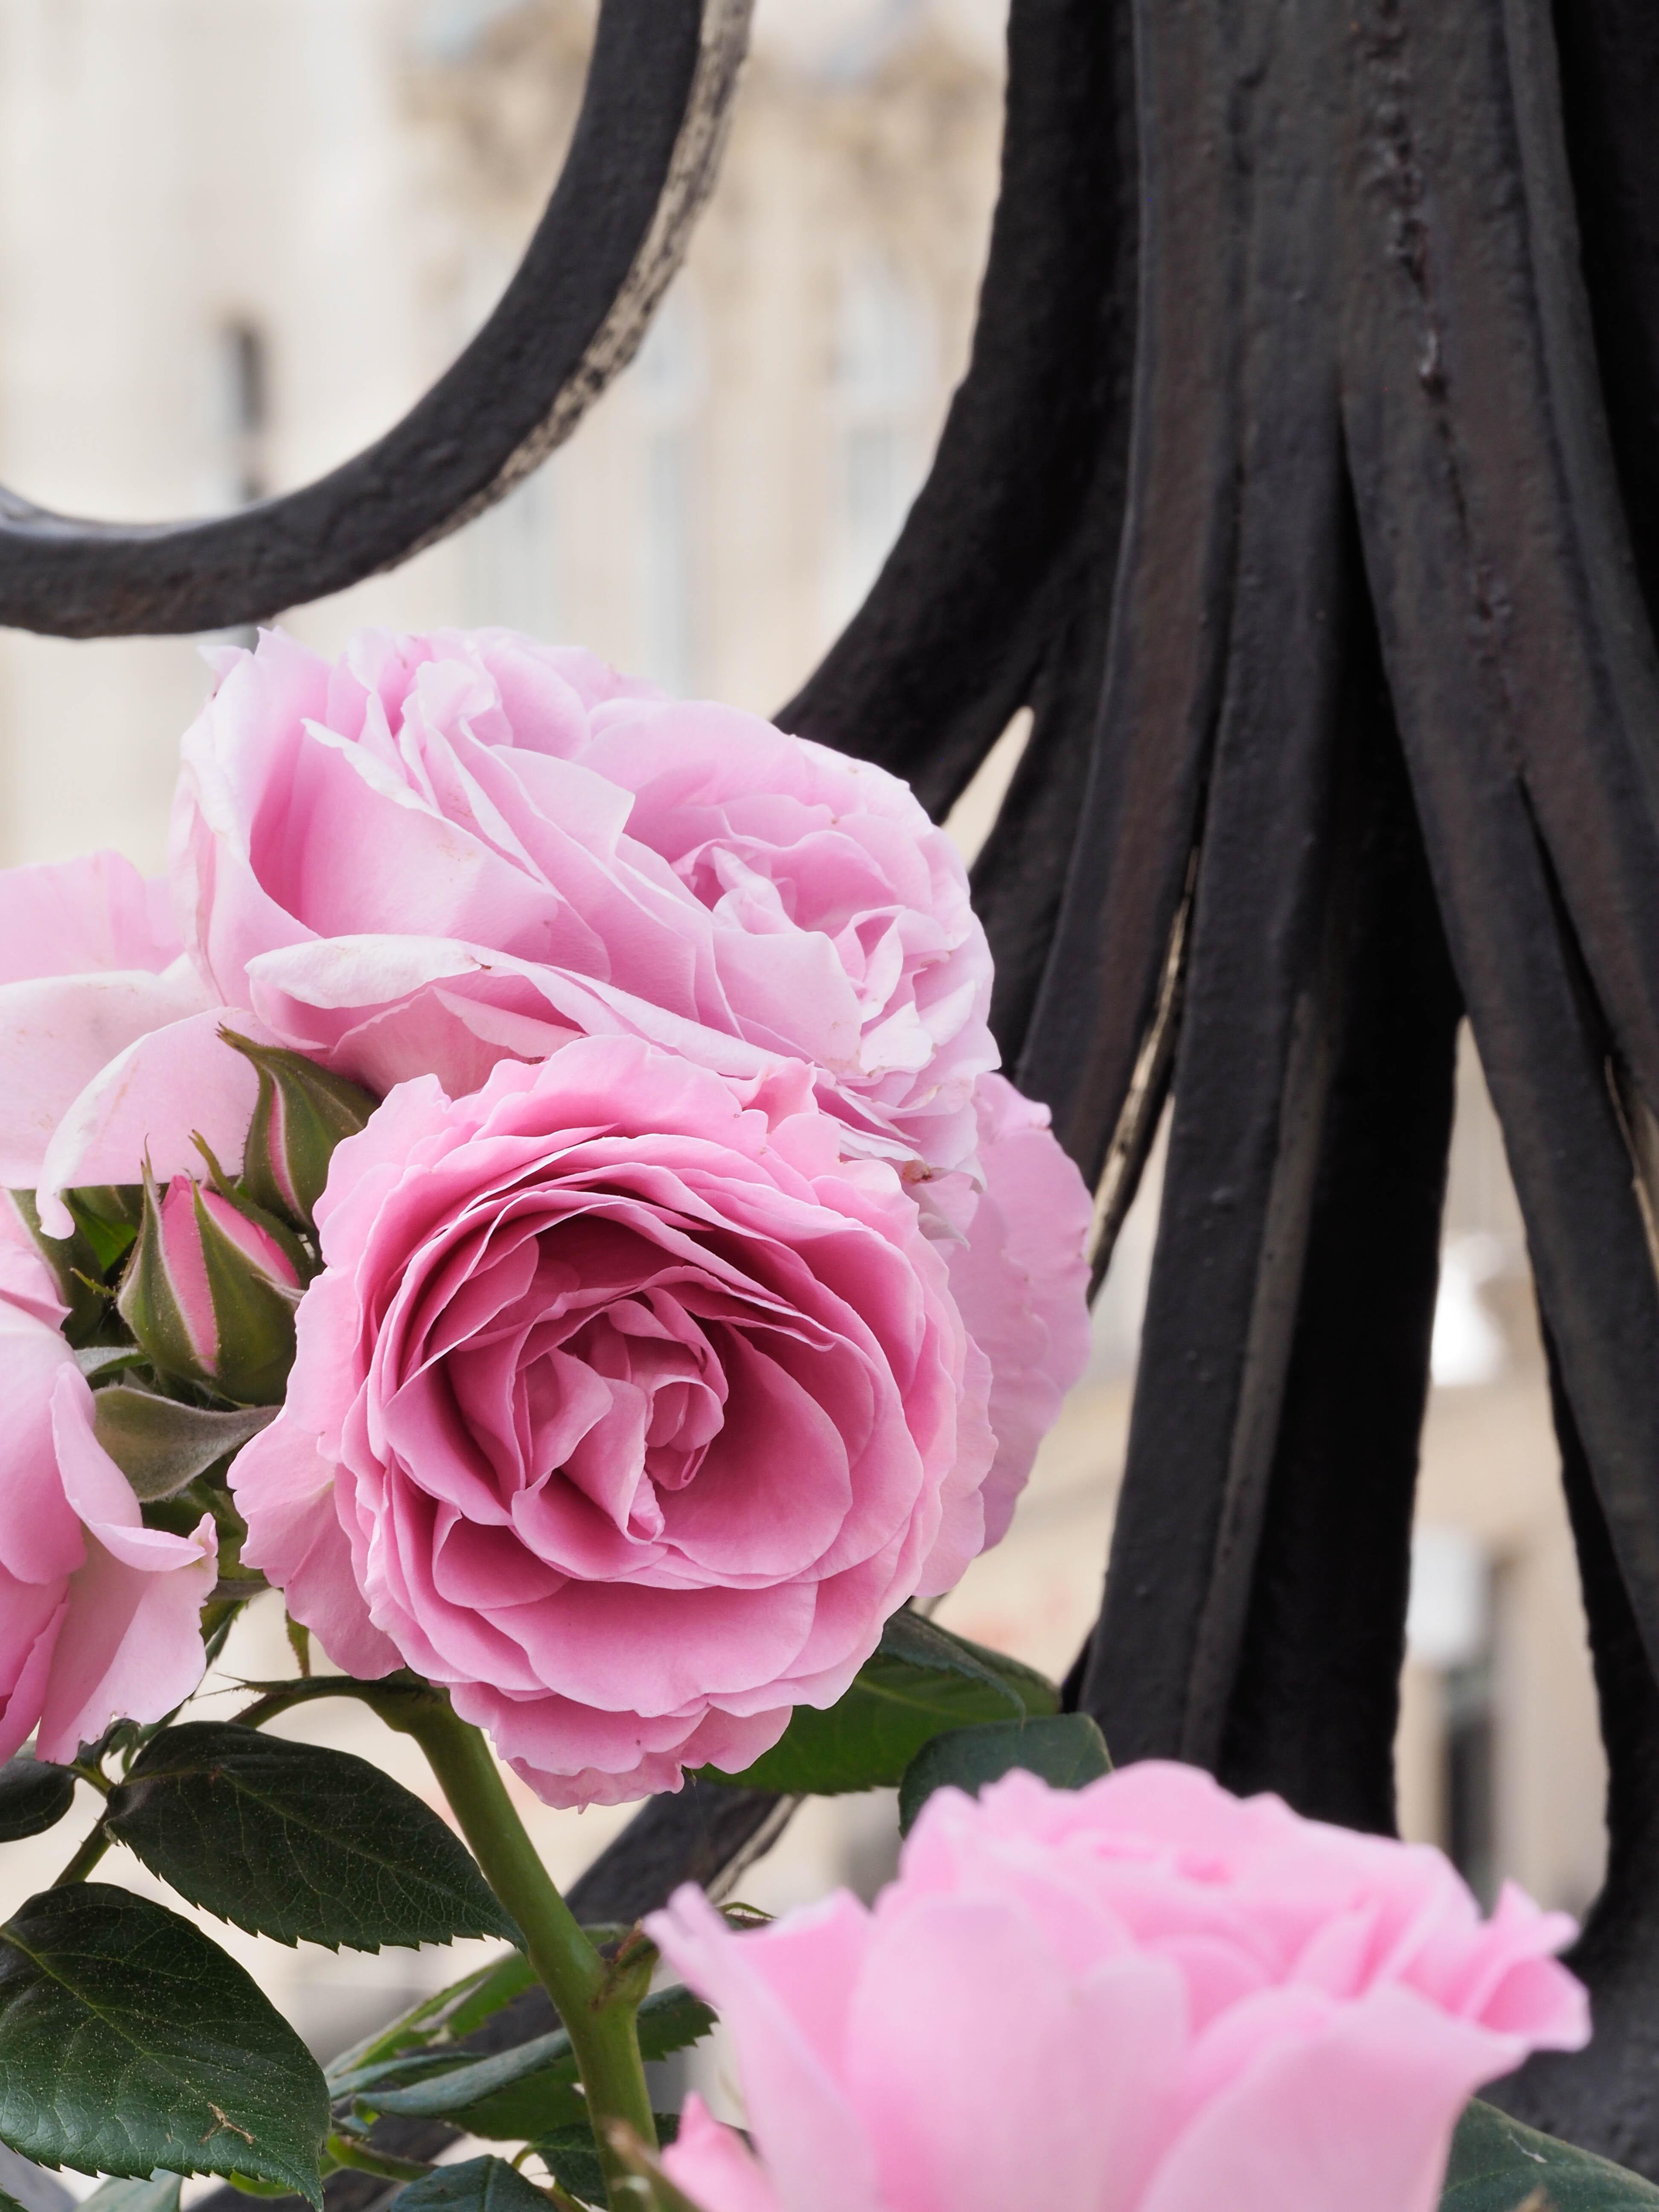 Englische Rosen Balkon